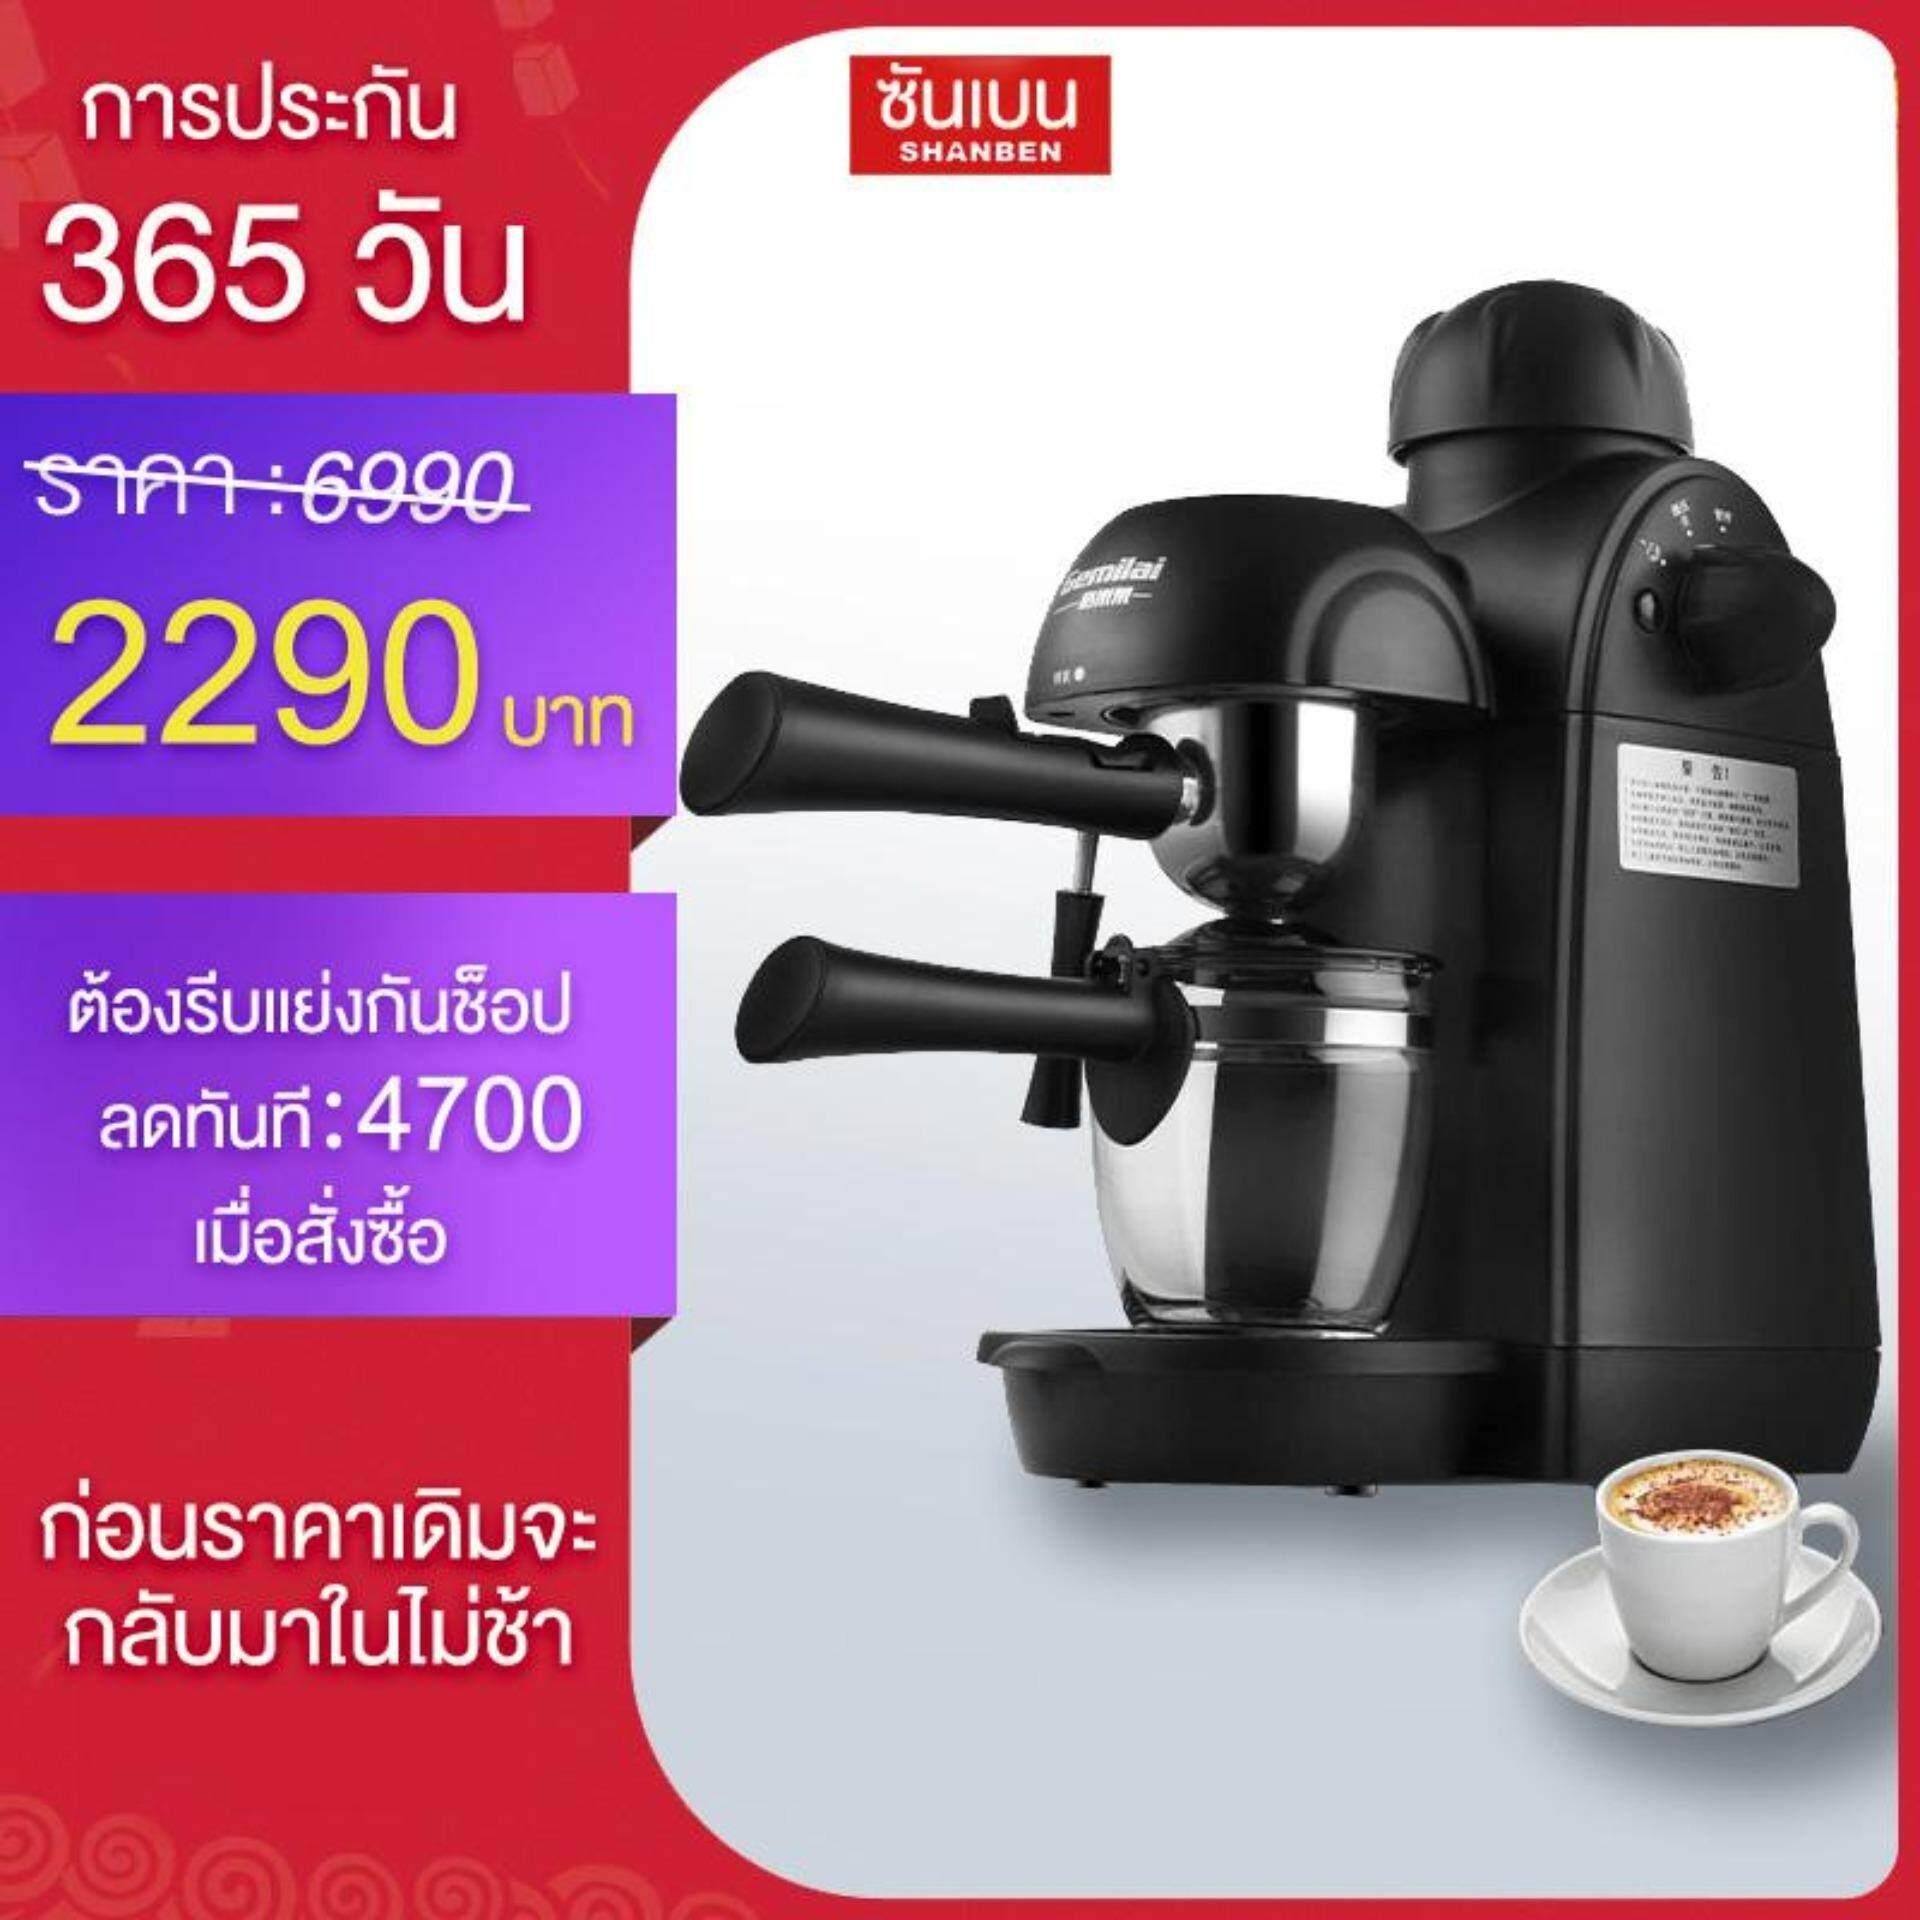 SHANBEN เครื่องชงกาแฟสด แบบก้านโยก Fresh coffee maker รุ่น